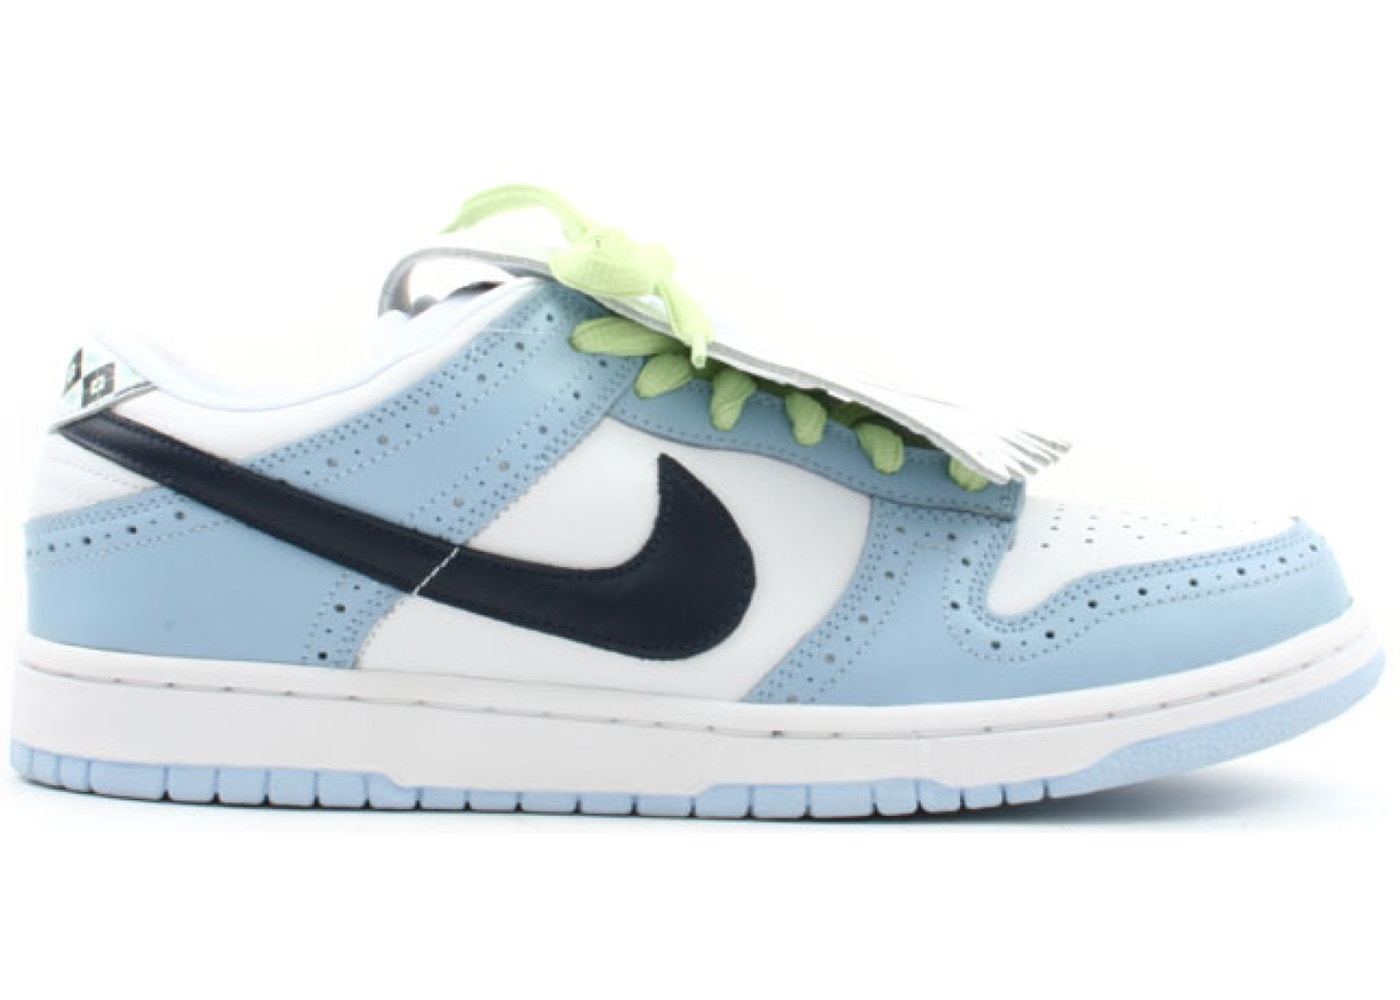 643459379dd1 Nike SB Dunk Low Golf Pack Blue - 313170-141